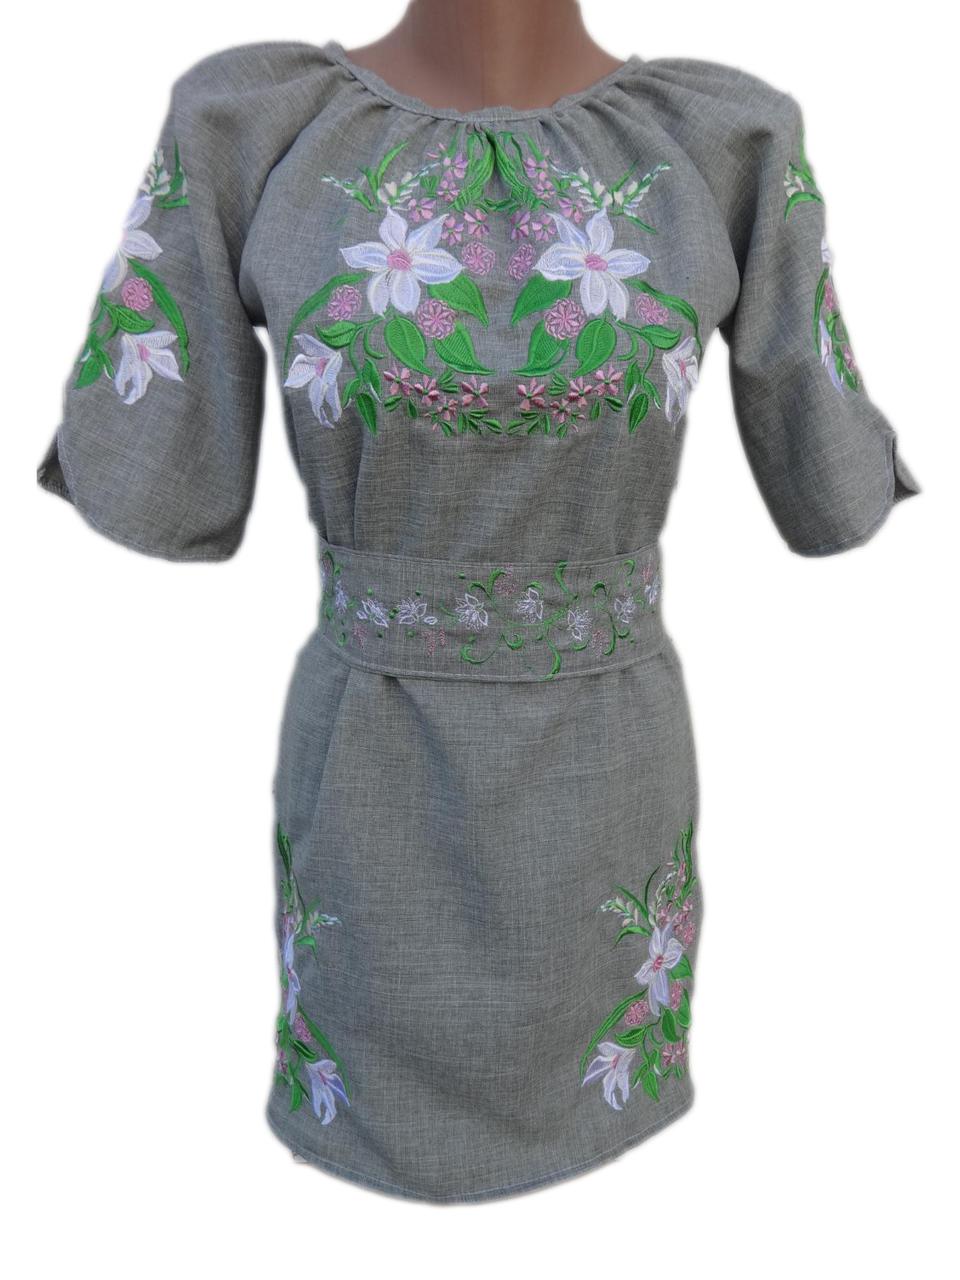 "Жіноче вишите плаття ""Ніжні лілії"" (Женское вышитое платье ""Нежные лилии"") PN-0053"